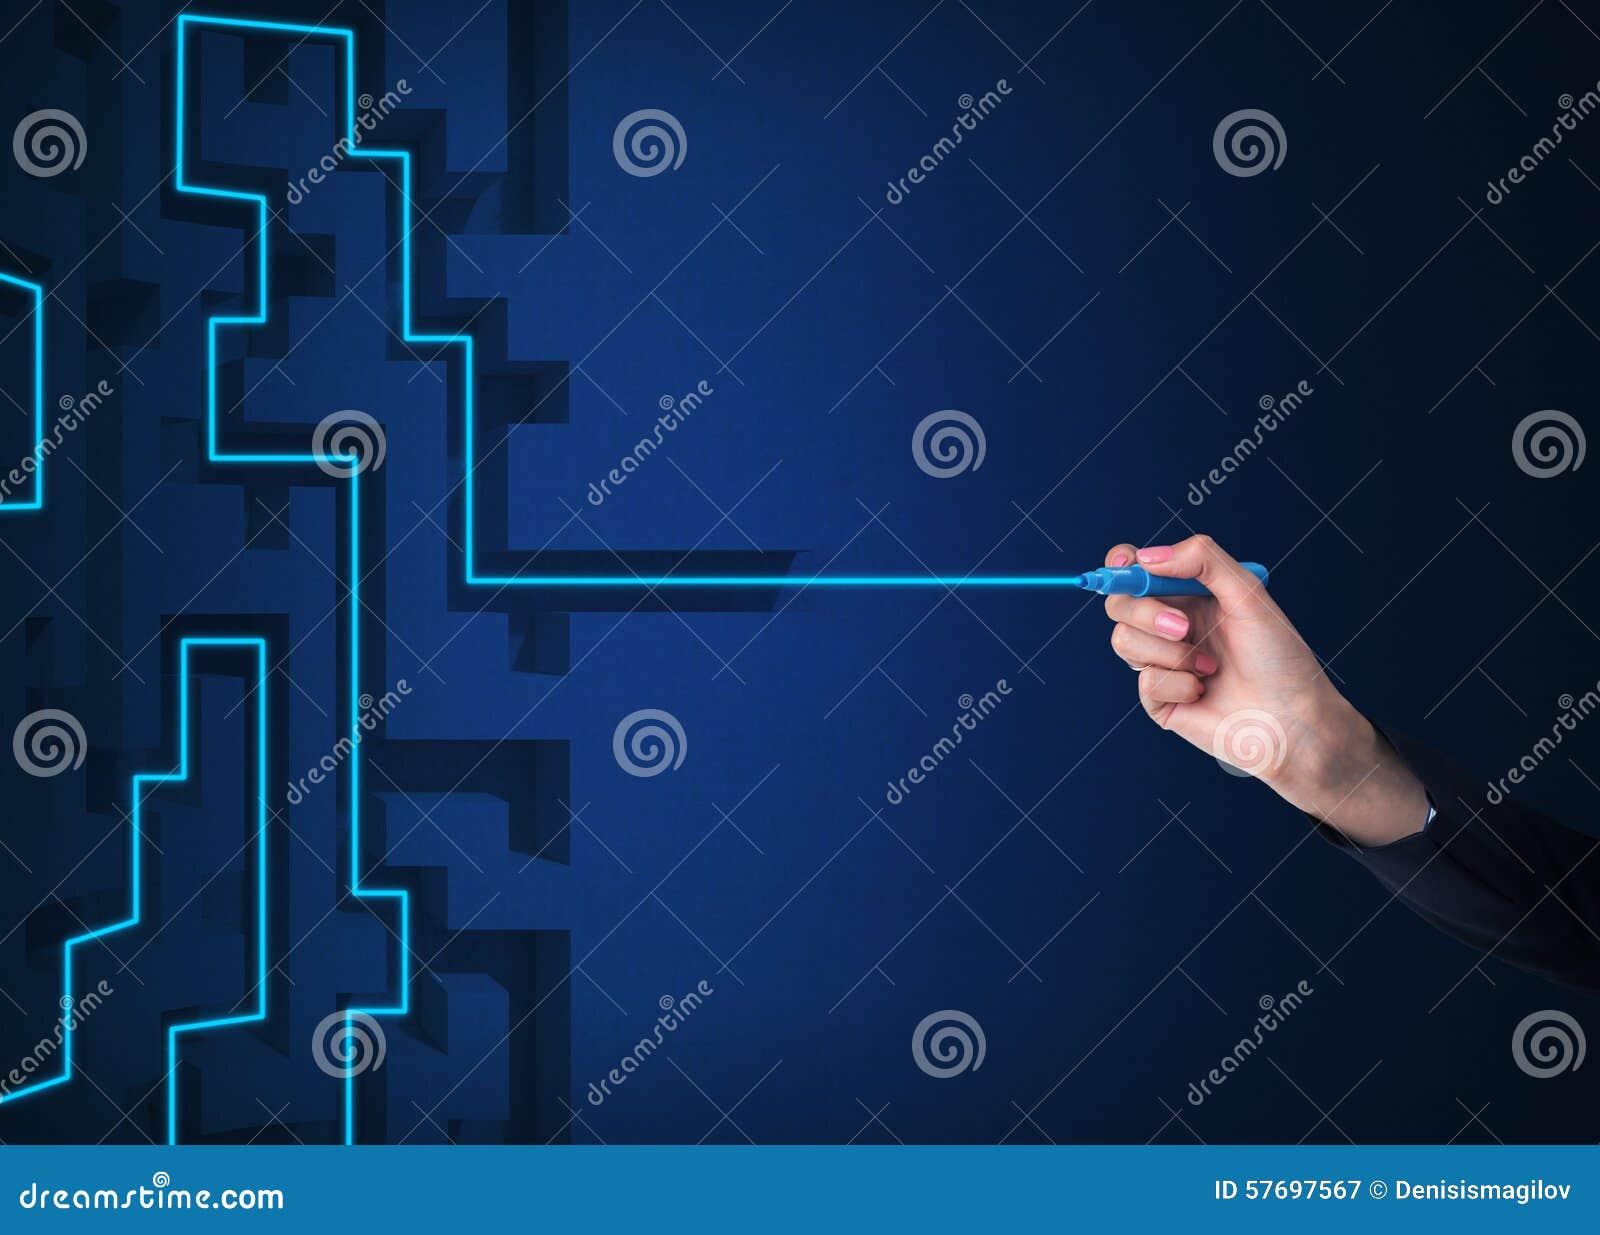 Рука рисует линию как решение лабиринта